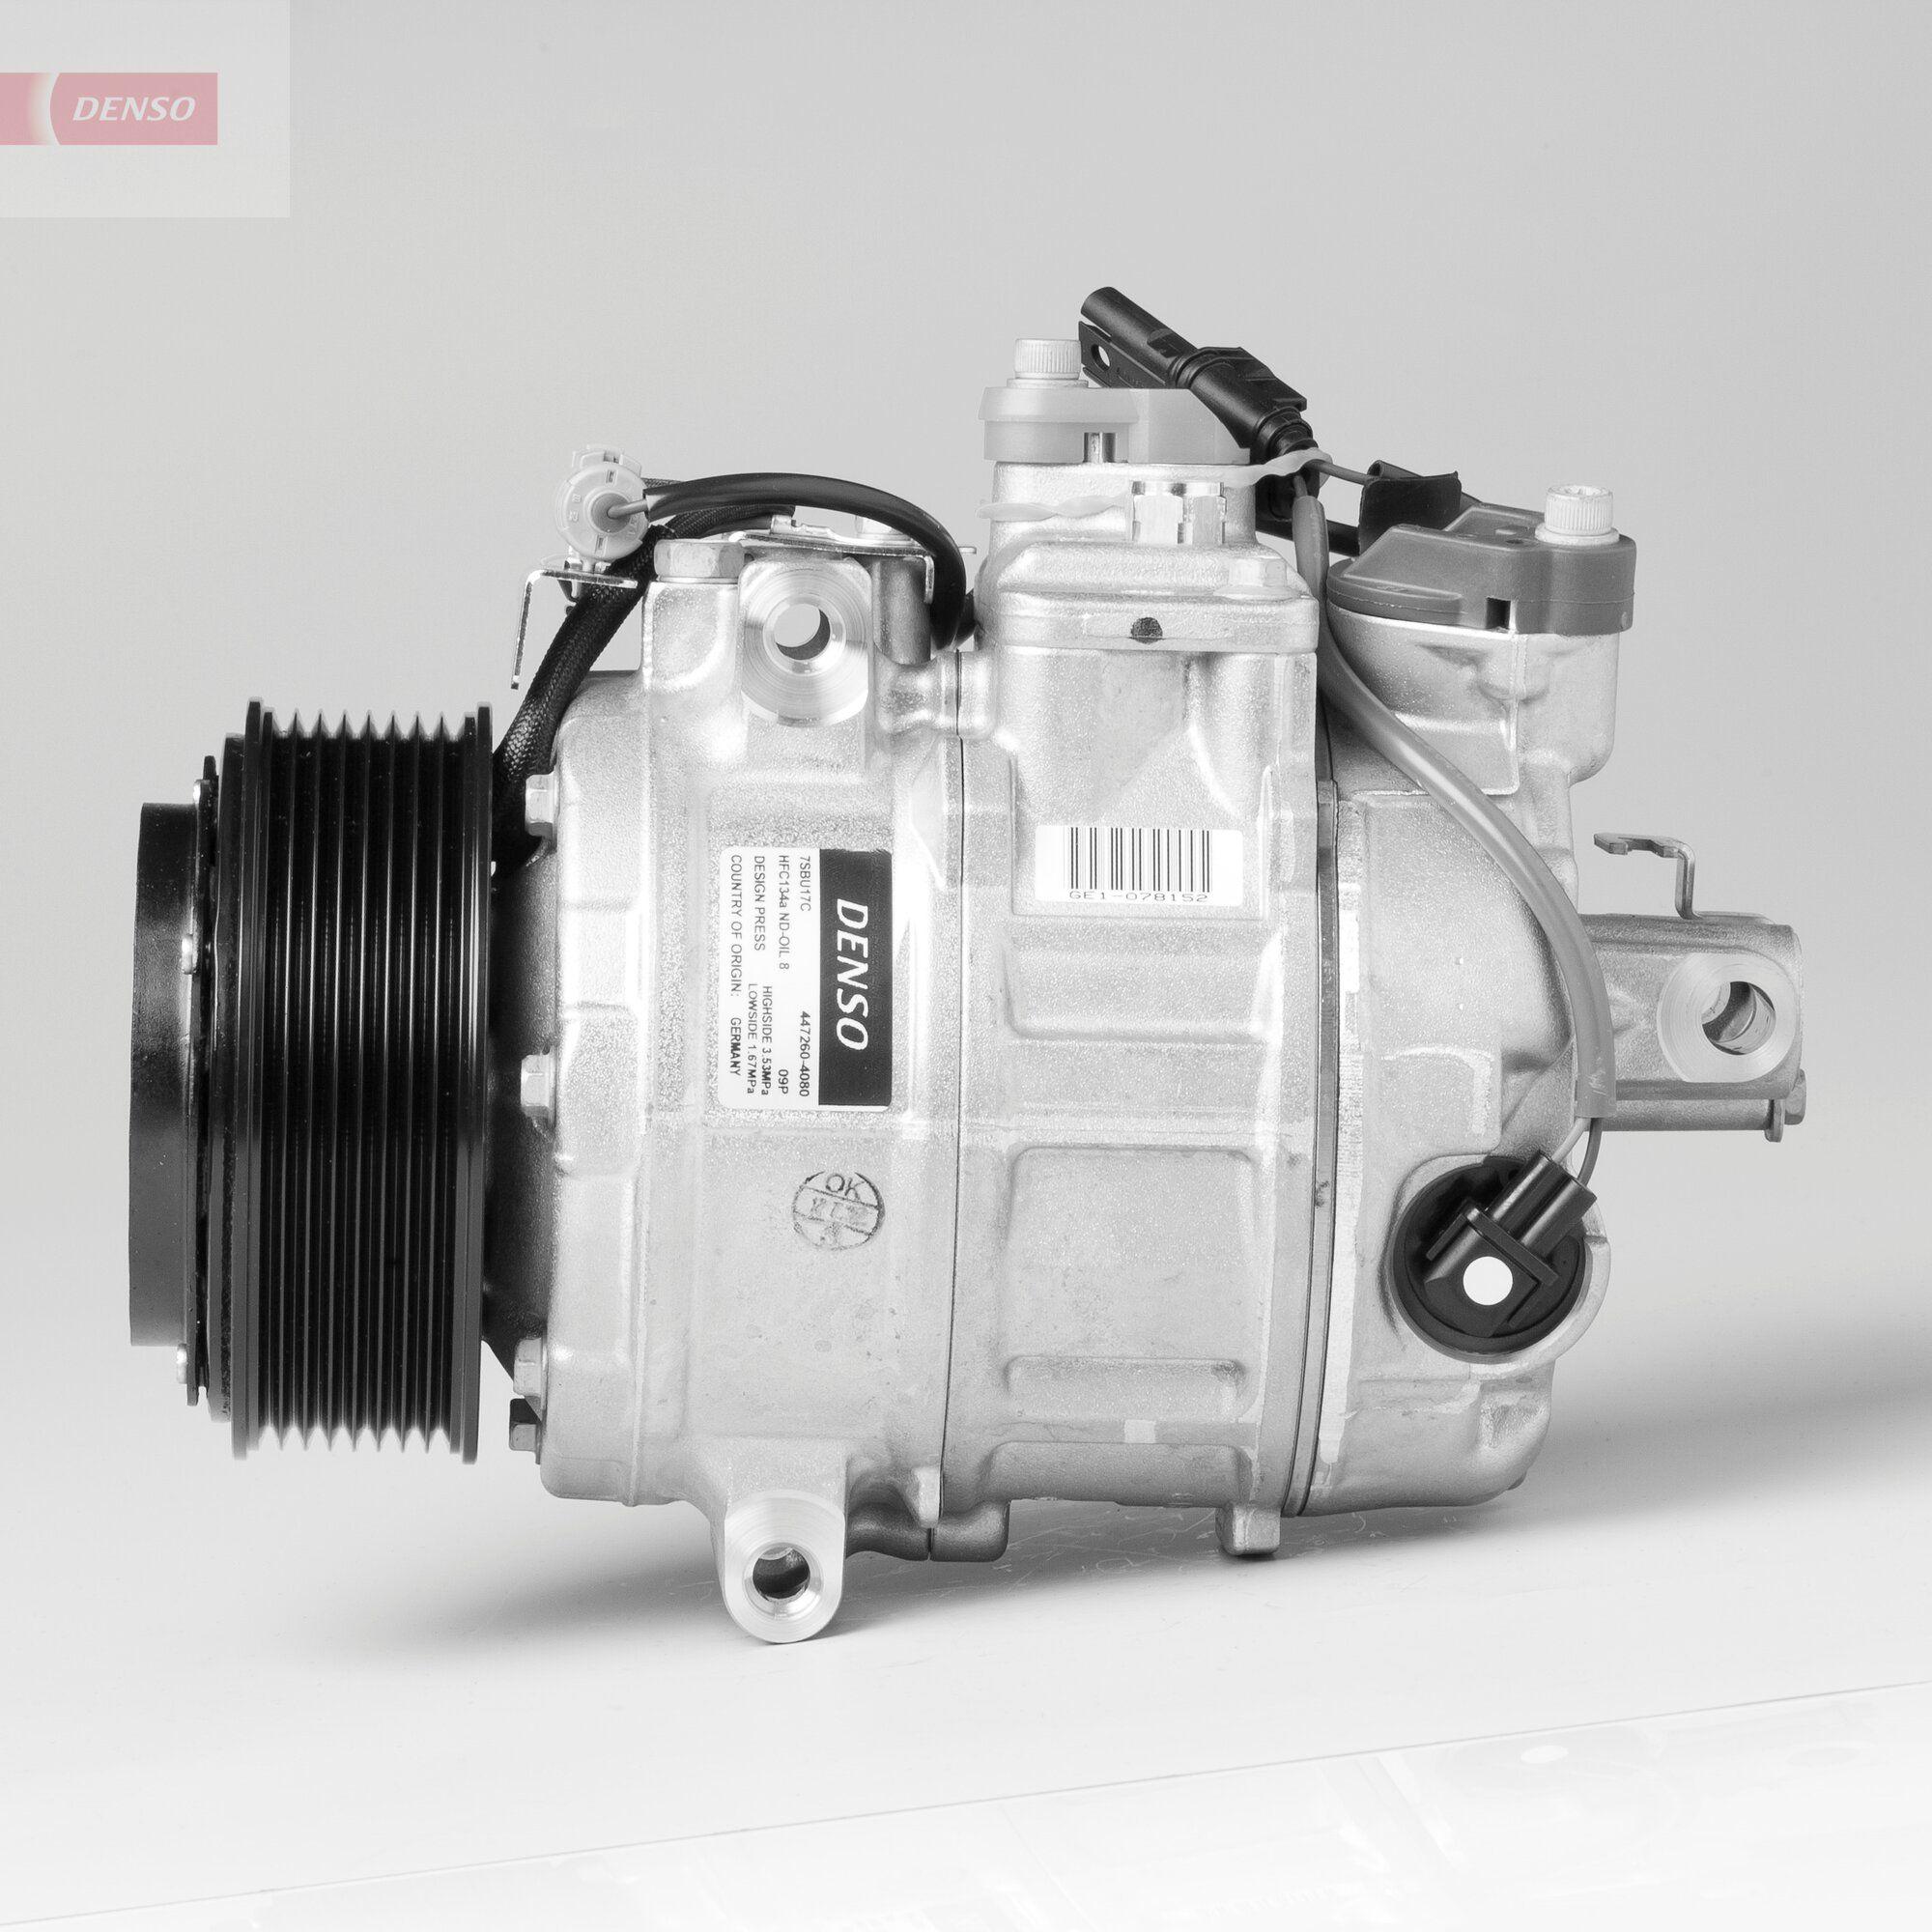 Kompressor Klimaanlage DENSO DCP05078